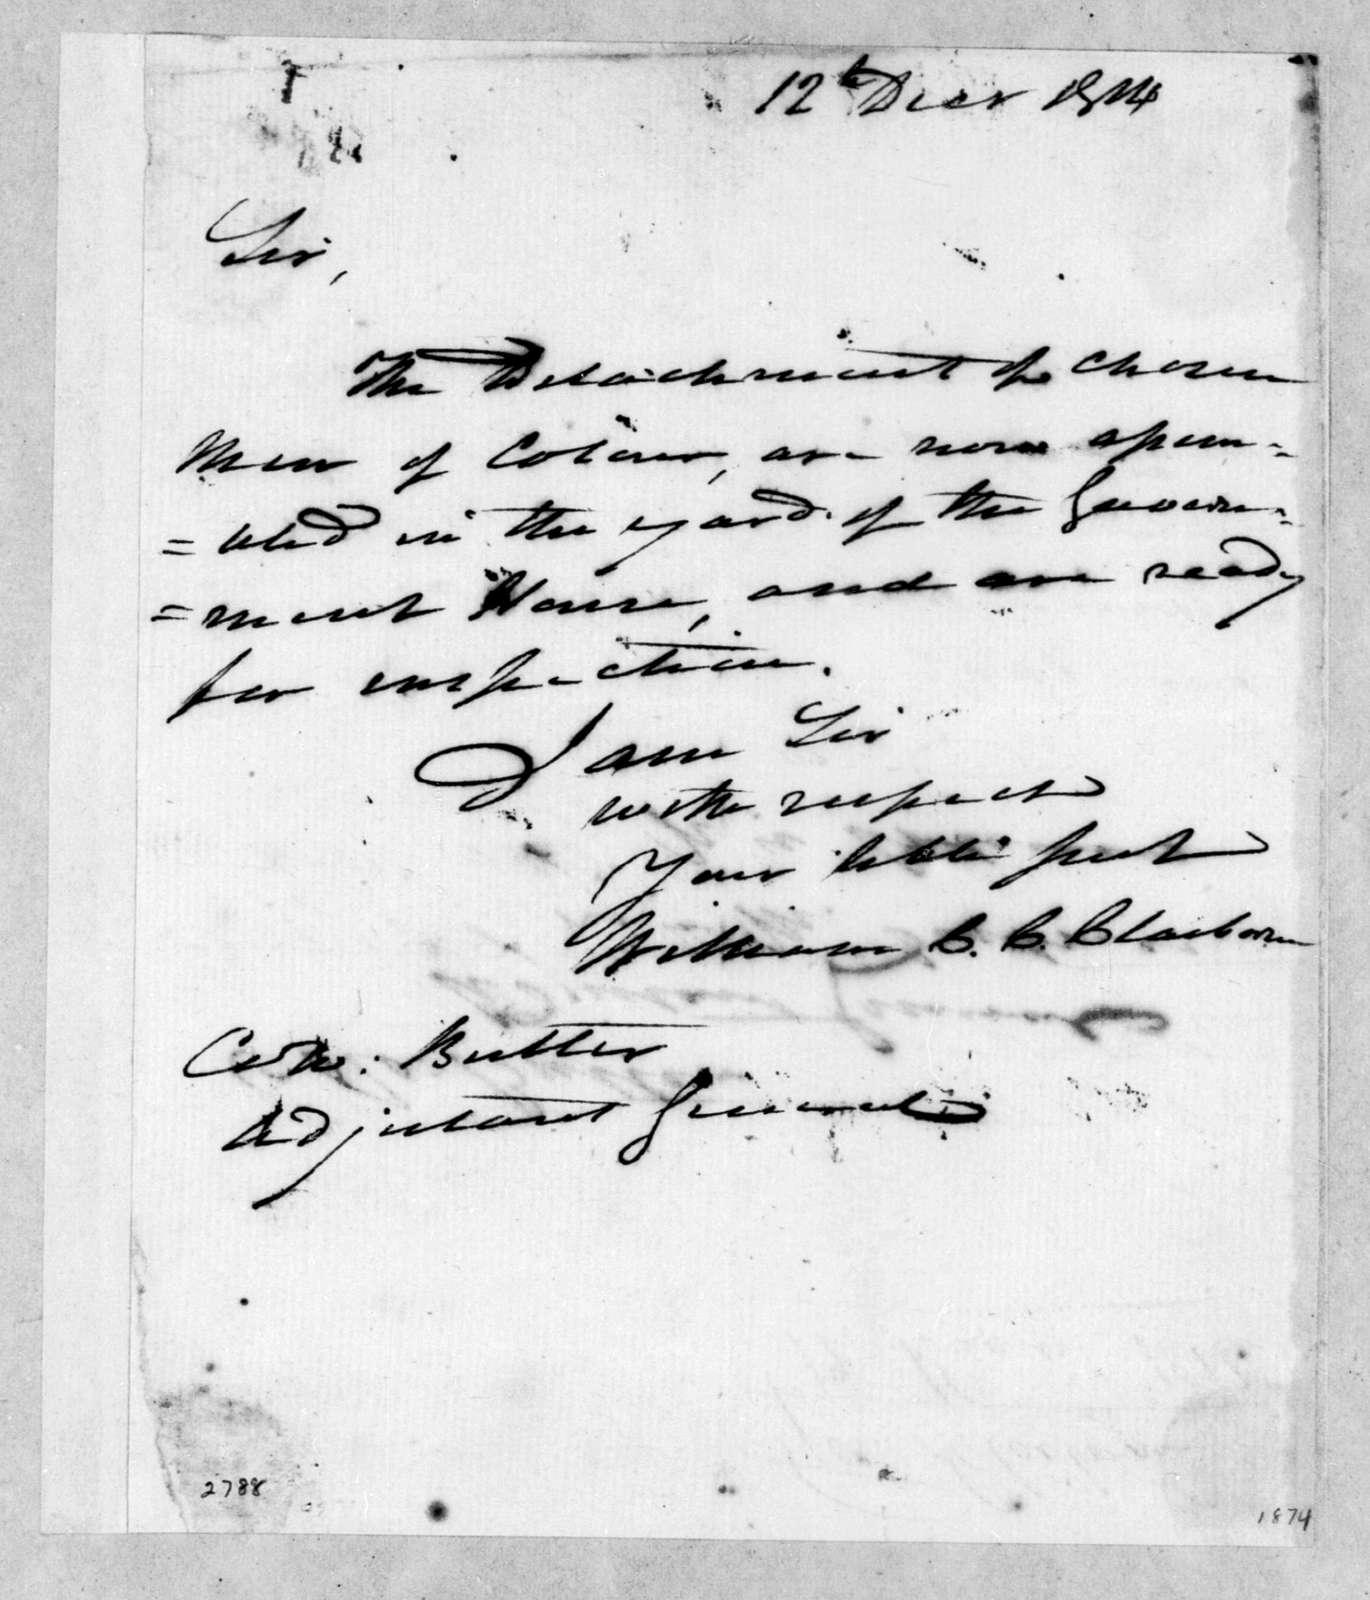 William Charles Cole Claiborne to Robert Butler, December 12, 1814